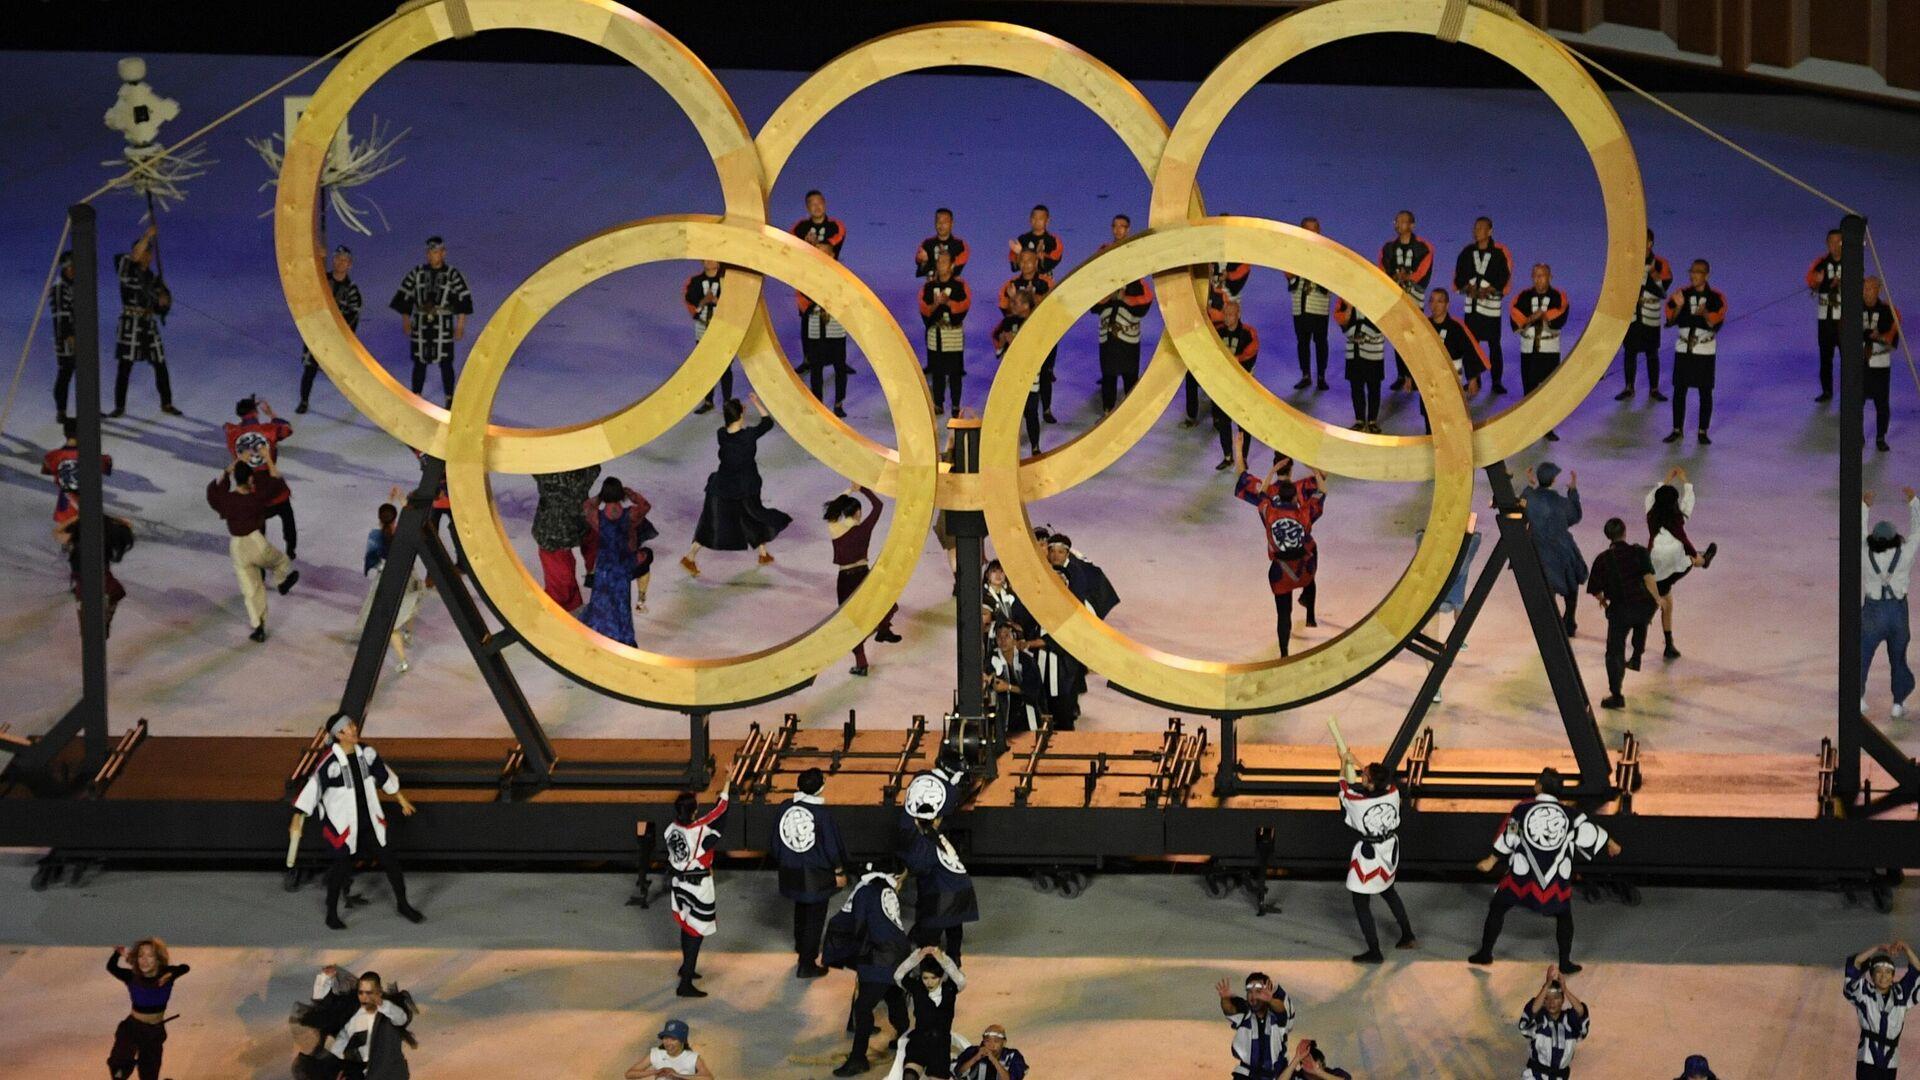 Церемония открытия XXXII летних Олимпийских игр - Sputnik Узбекистан, 1920, 23.07.2021